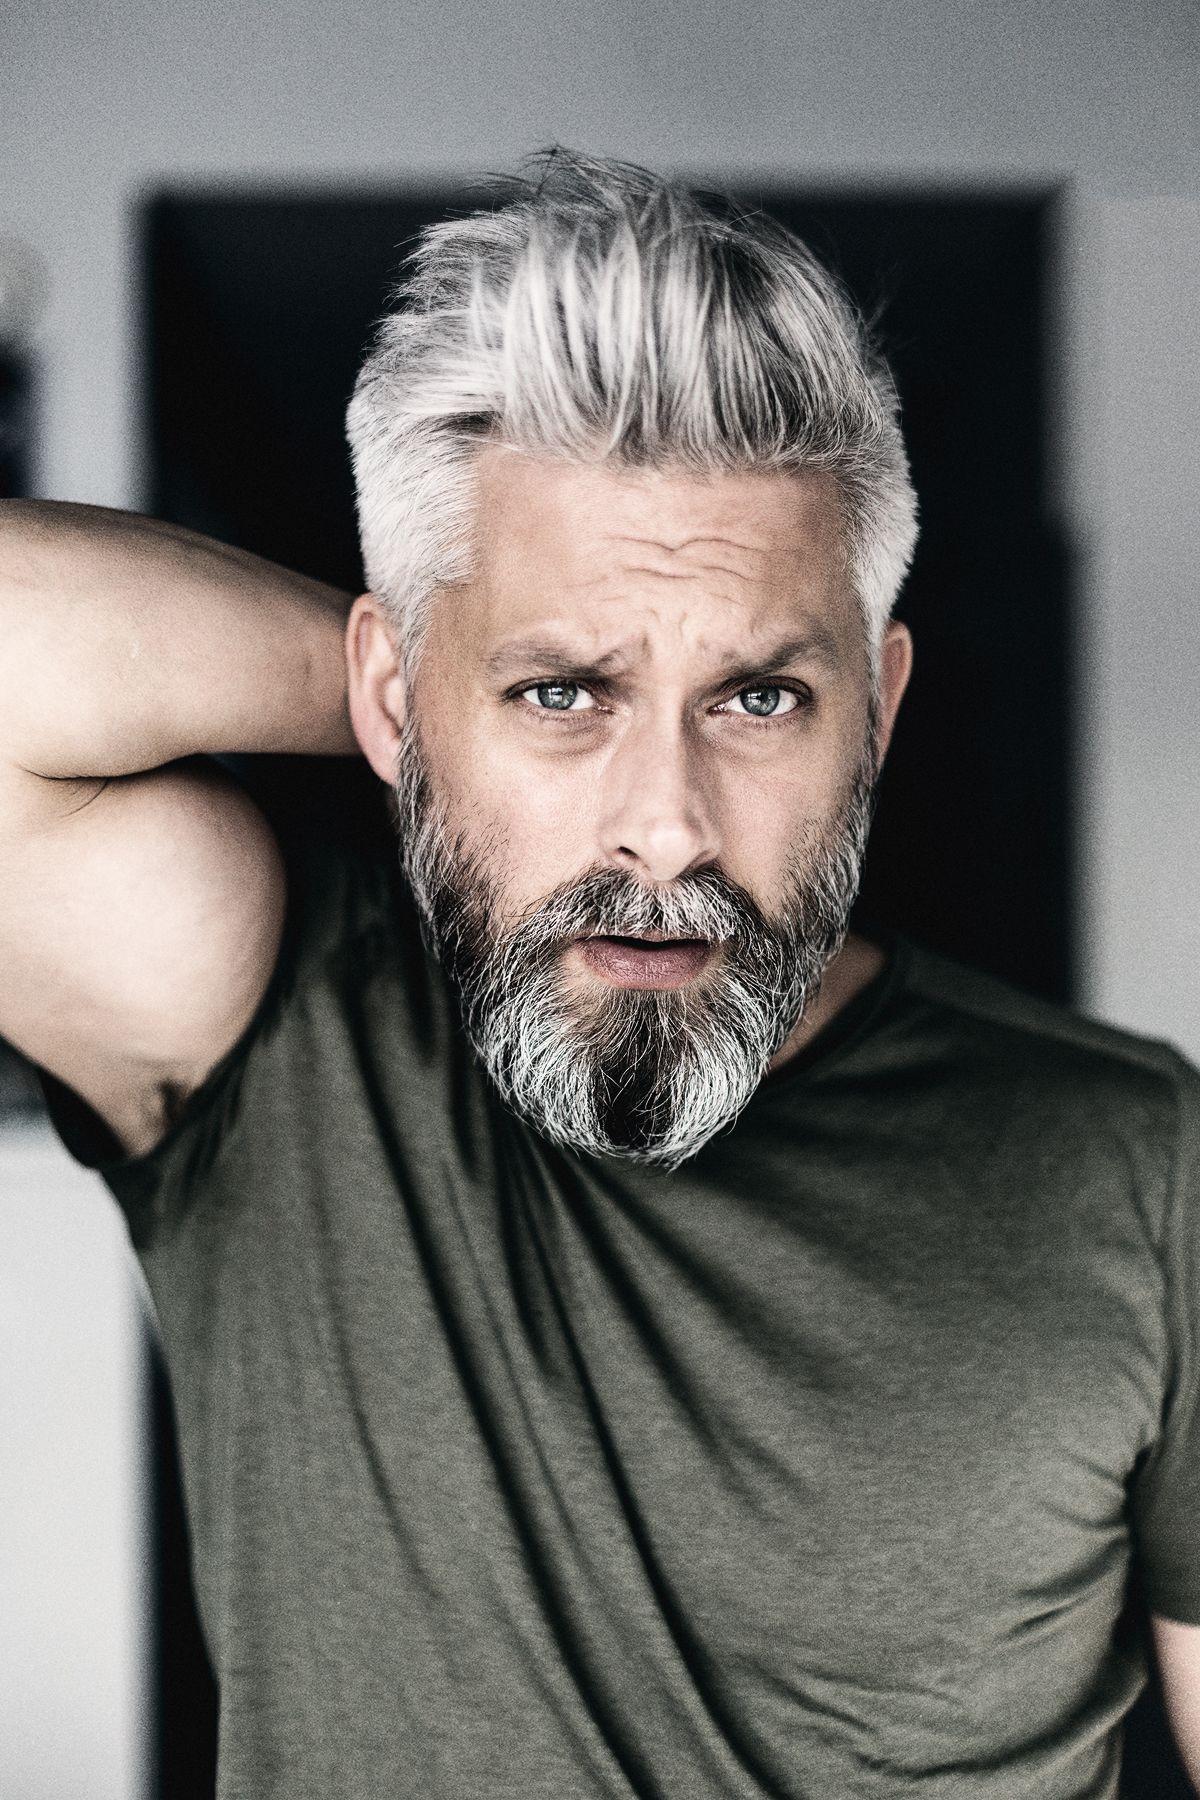 Model Swedish Grey Hair Silverfox Mens Style Beard Grooming Silver Male Men S Apperal Men S Clothes Beard Styles For Men Beard Grooming Beard Styles